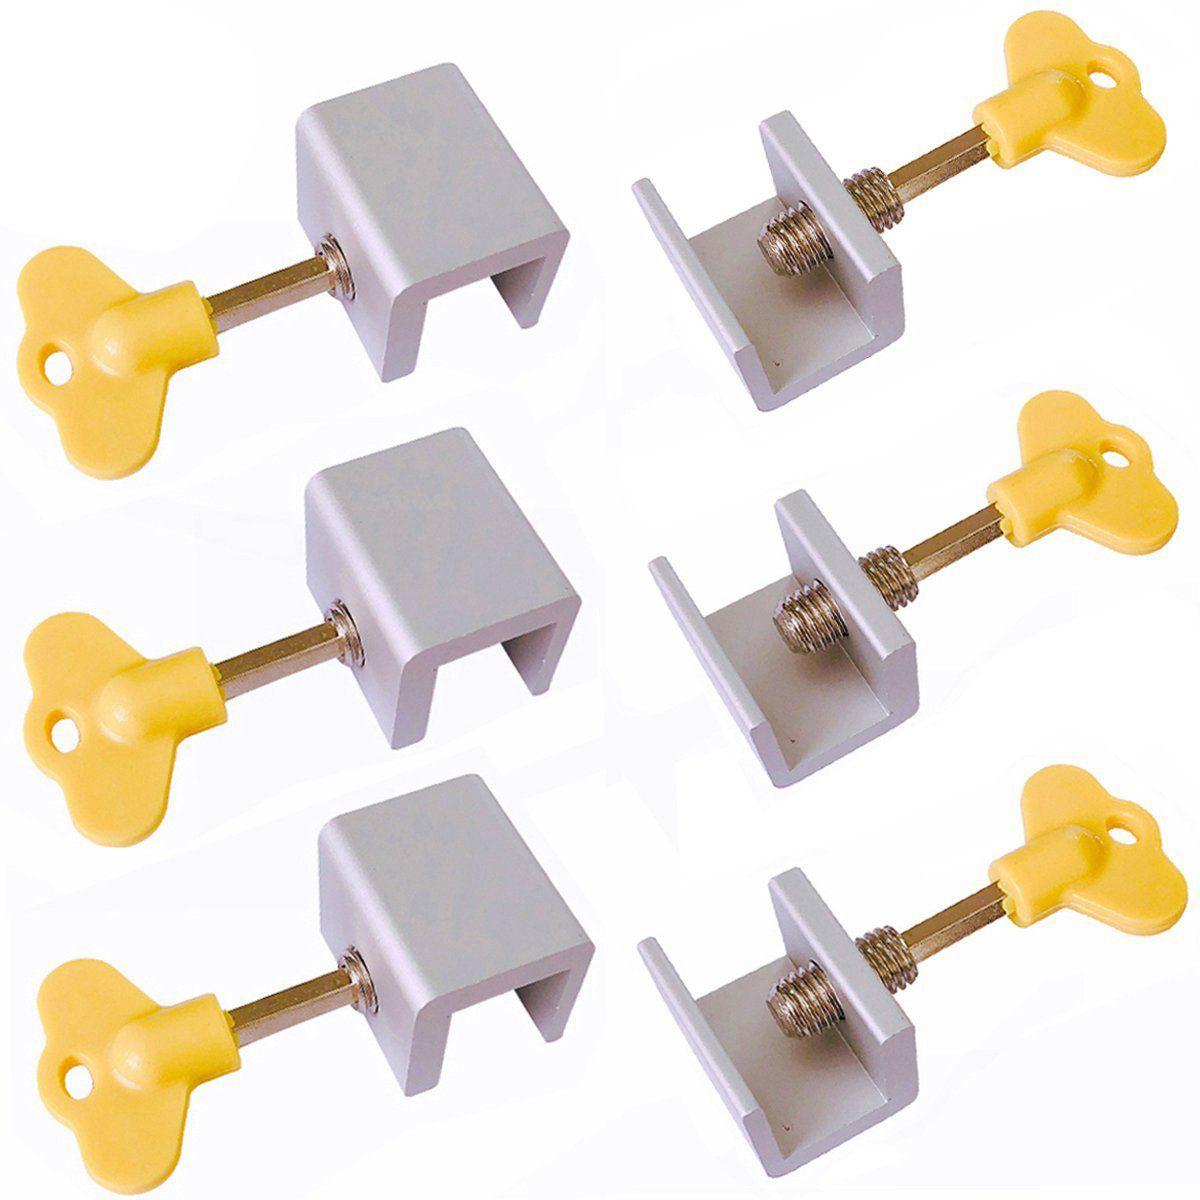 6 Pieces Adjustable Sliding Window Locks Stops Aluminum Alloy Door Frame Security Lock with Keys Cabinet Locks & Straps     - title=